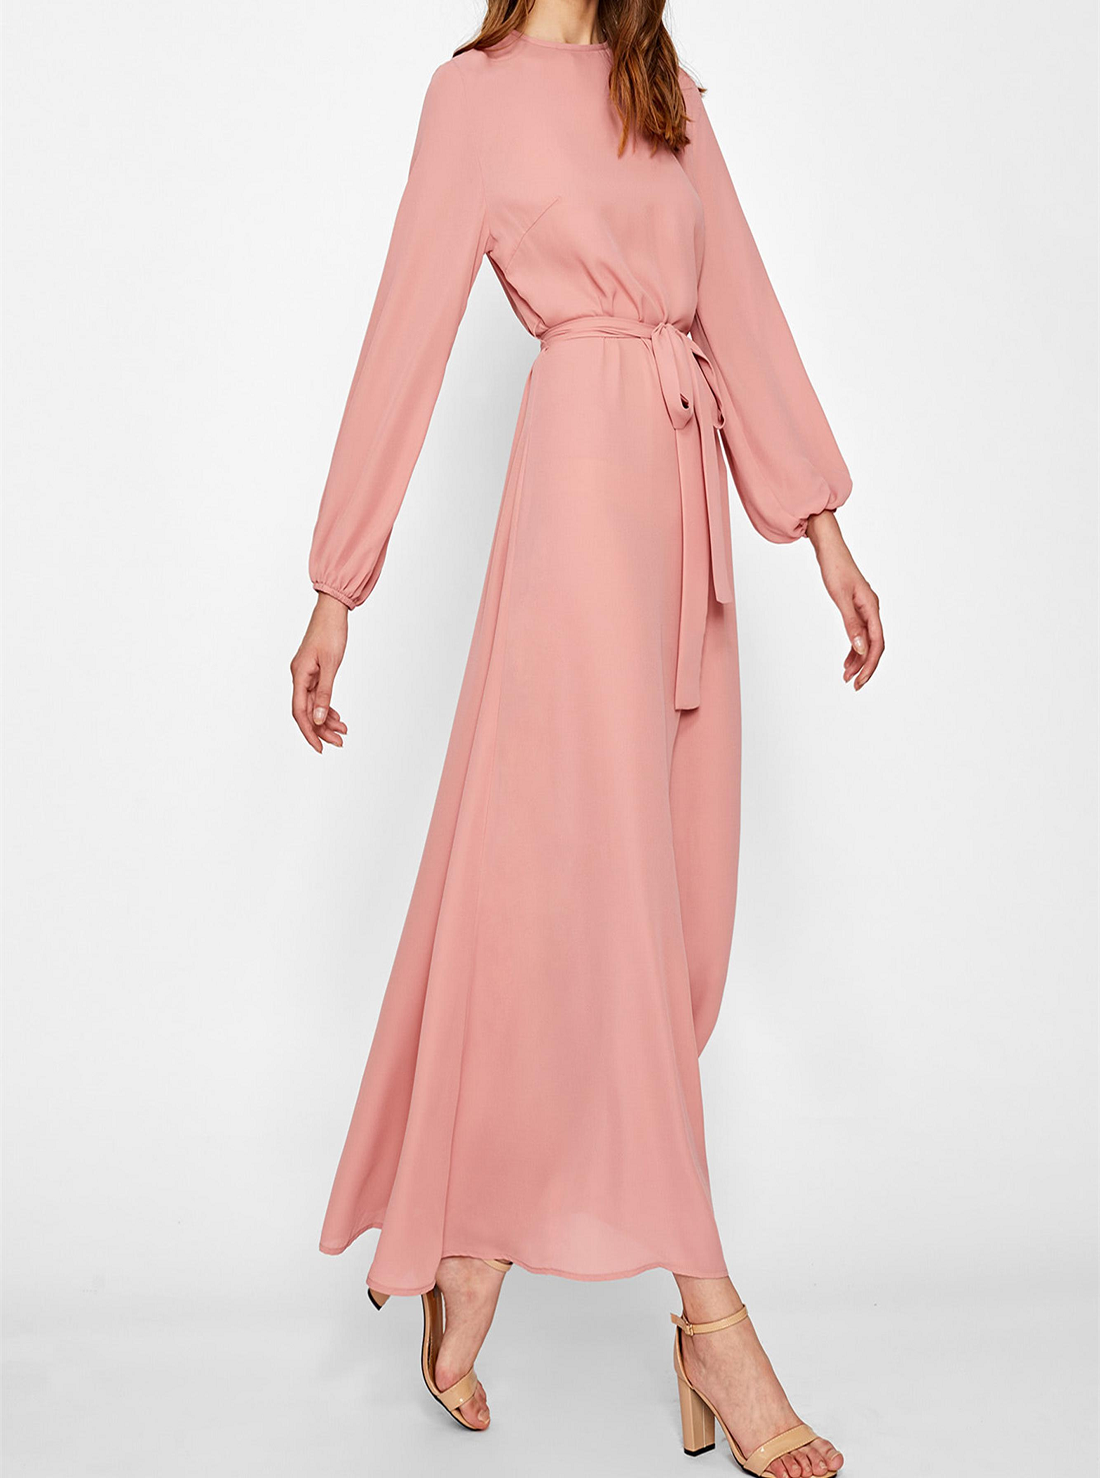 3 Wholesale Long Sleeve Maxi Dresses